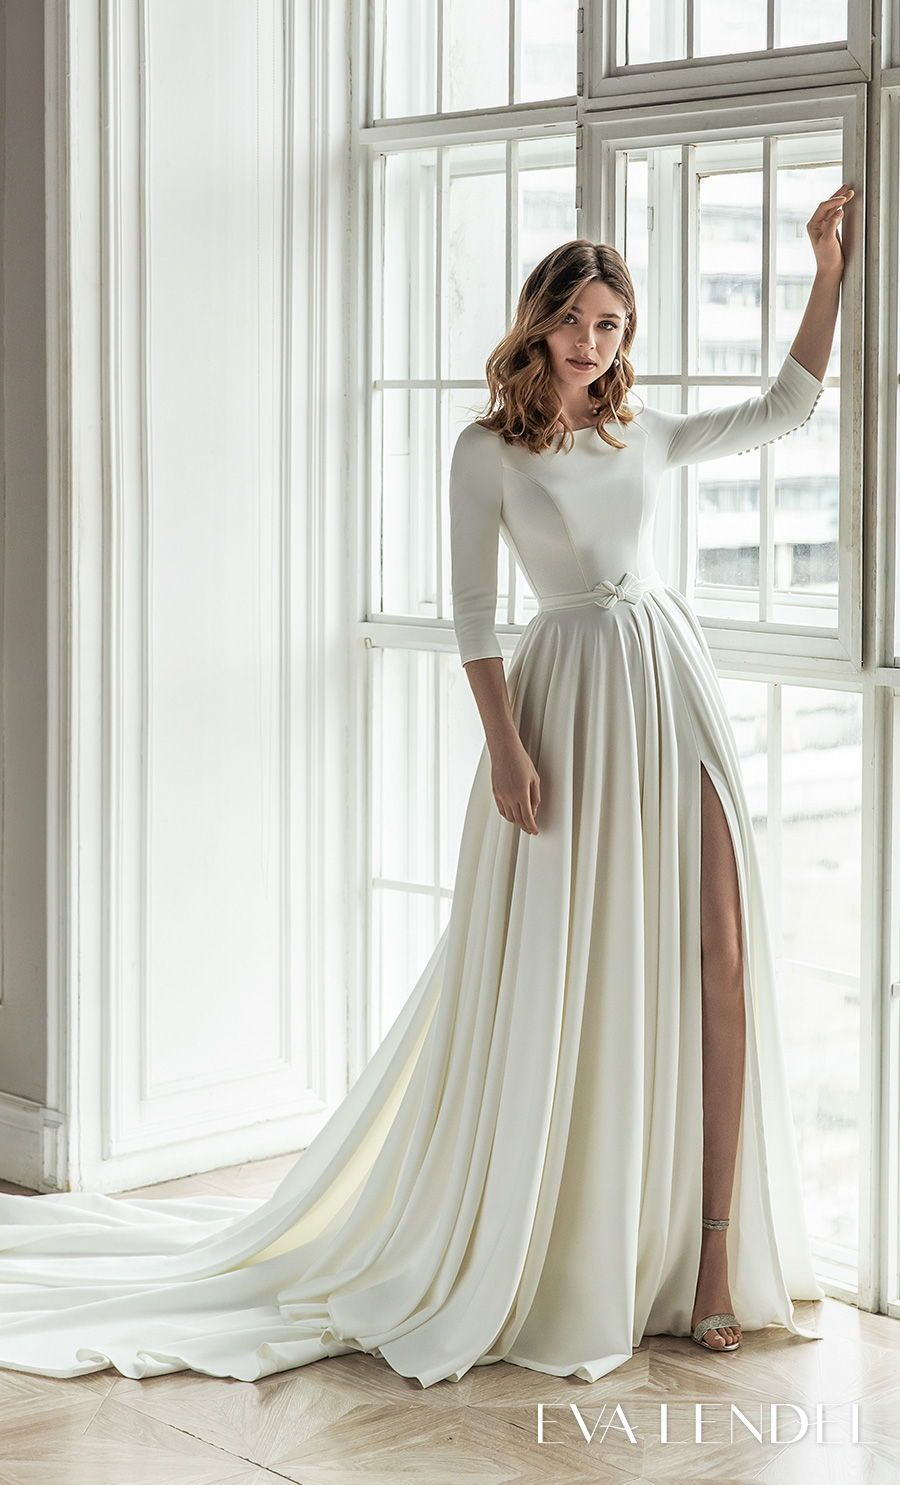 Eva Lendel 2021 Wedding Dresses Less Is More Bridal Collection Wedding Inspirasi Wedding Dresses Sheer Wedding Dress Elegant Wedding Dress [ 1485 x 900 Pixel ]